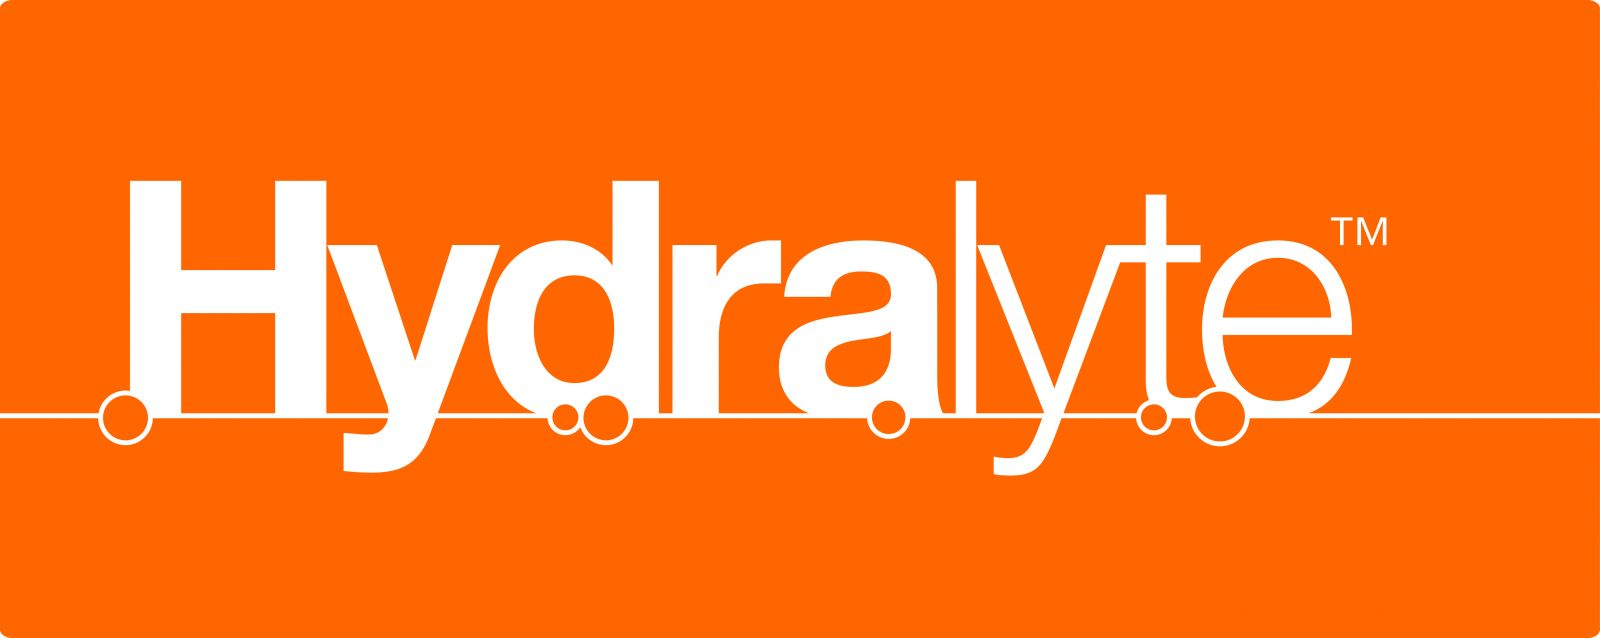 Hydralyte-Logo.jpg